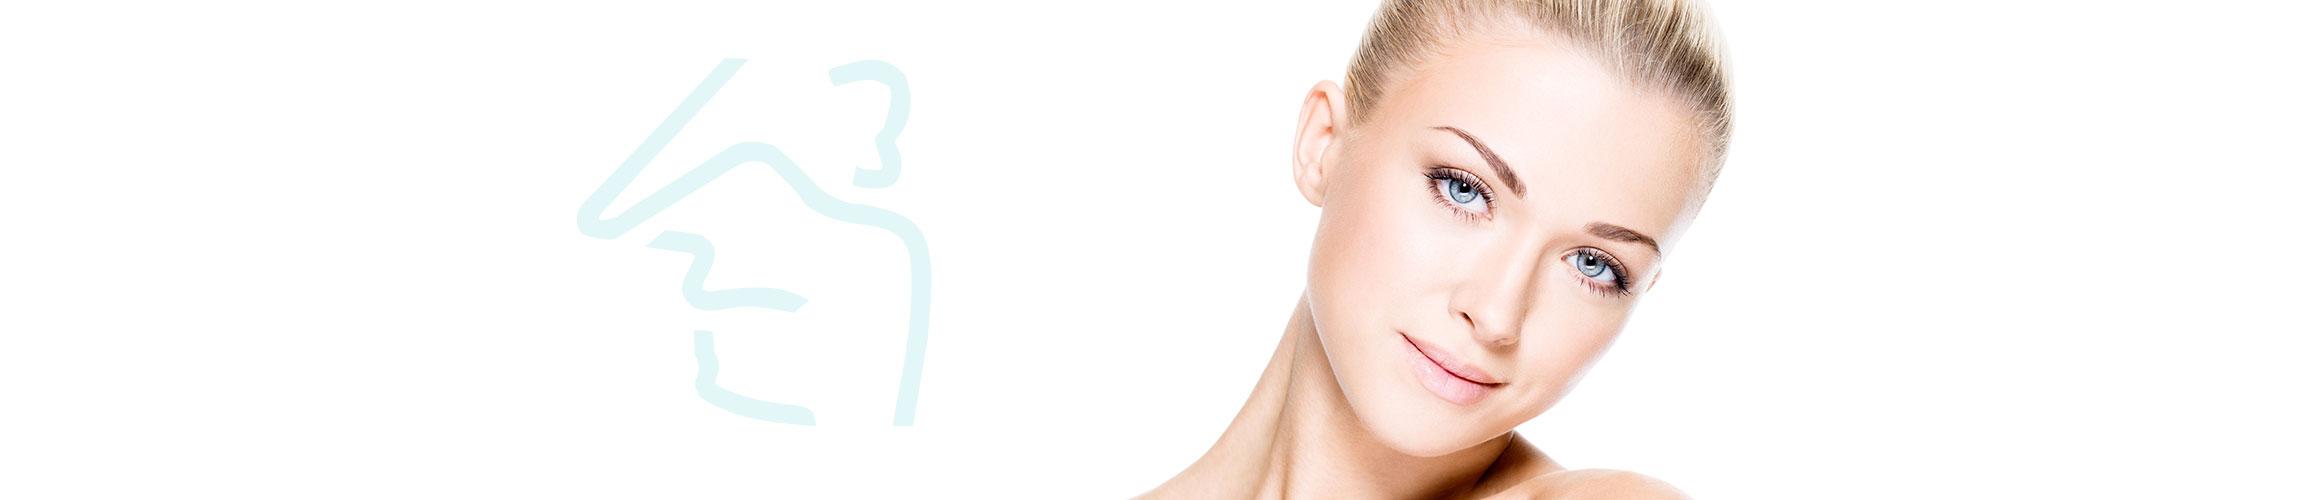 orl-grupo-de-otorrinolaringologia-patologia-cervico-facial1